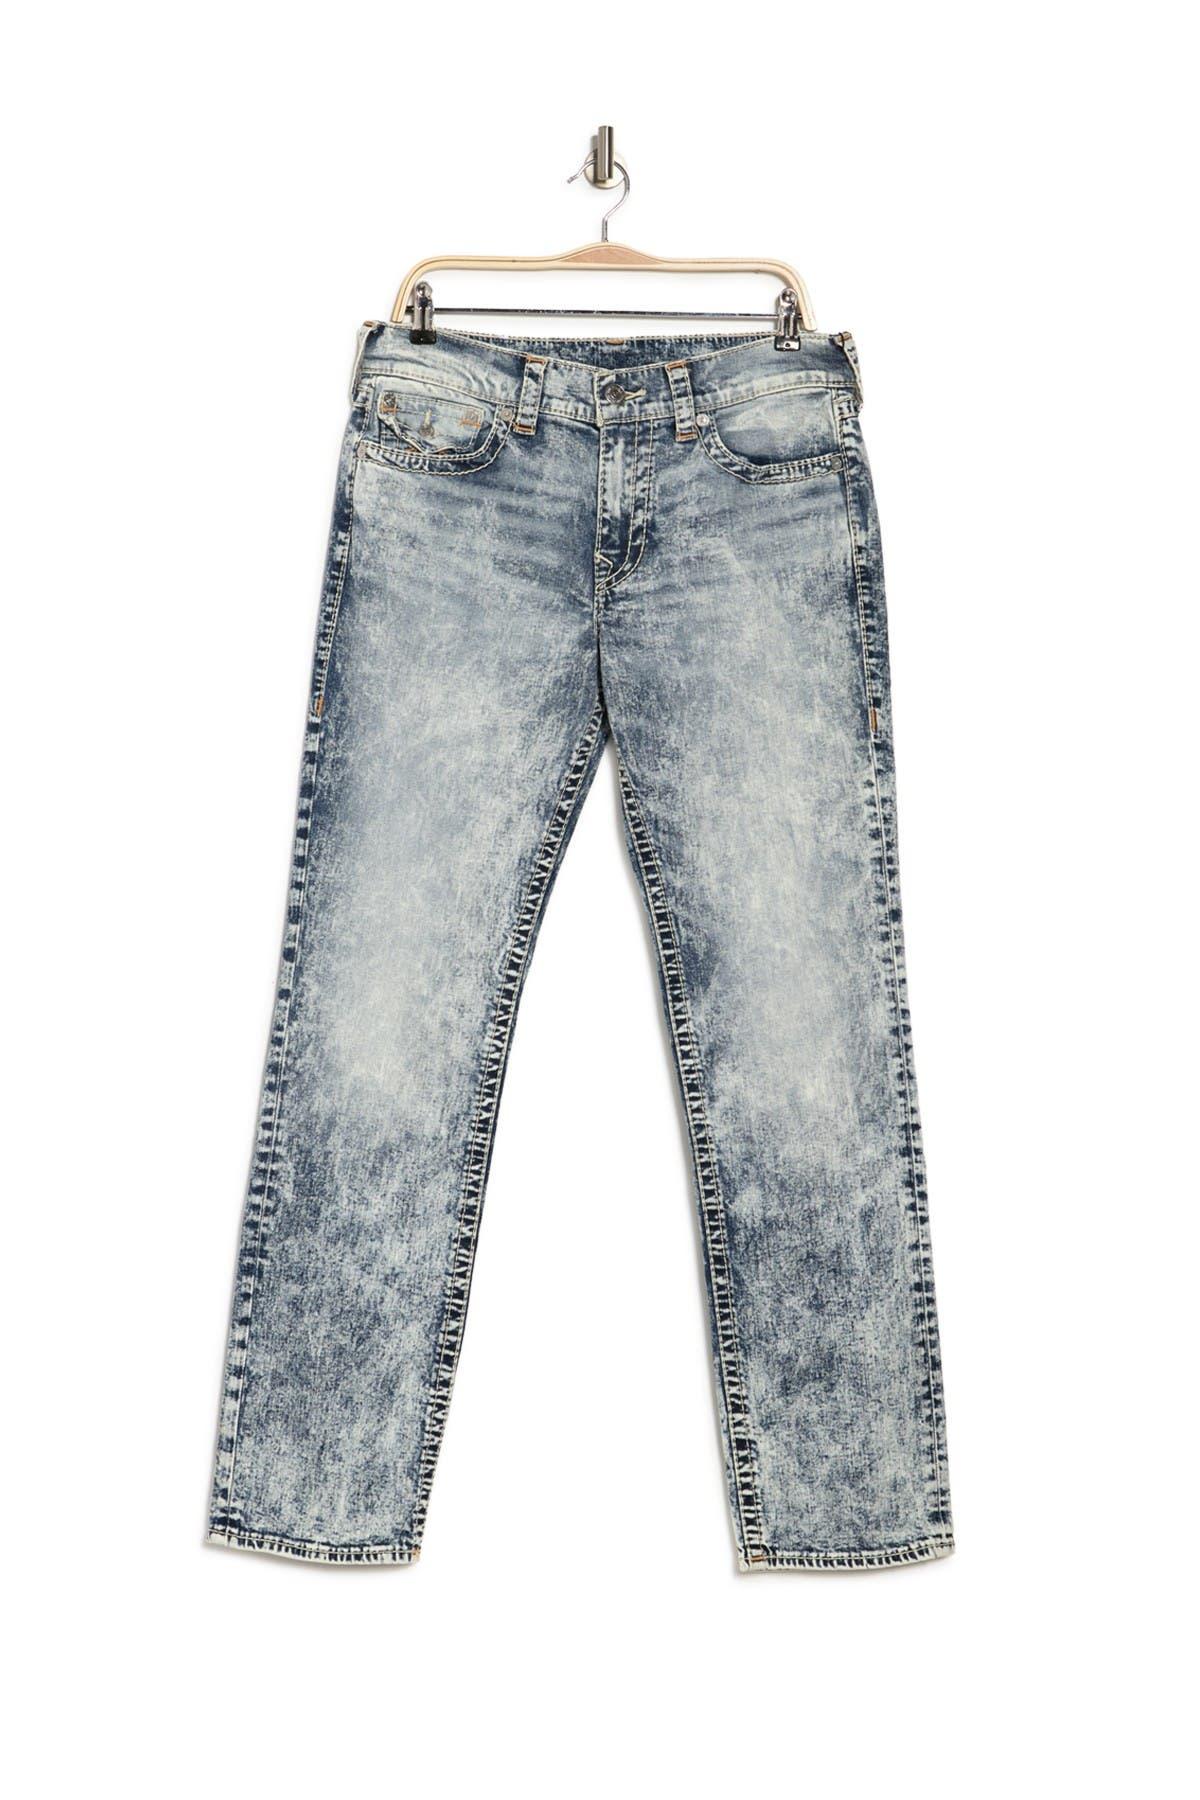 Image of True Religion Ricky Flap Big T Acid Wash Straight Jeans